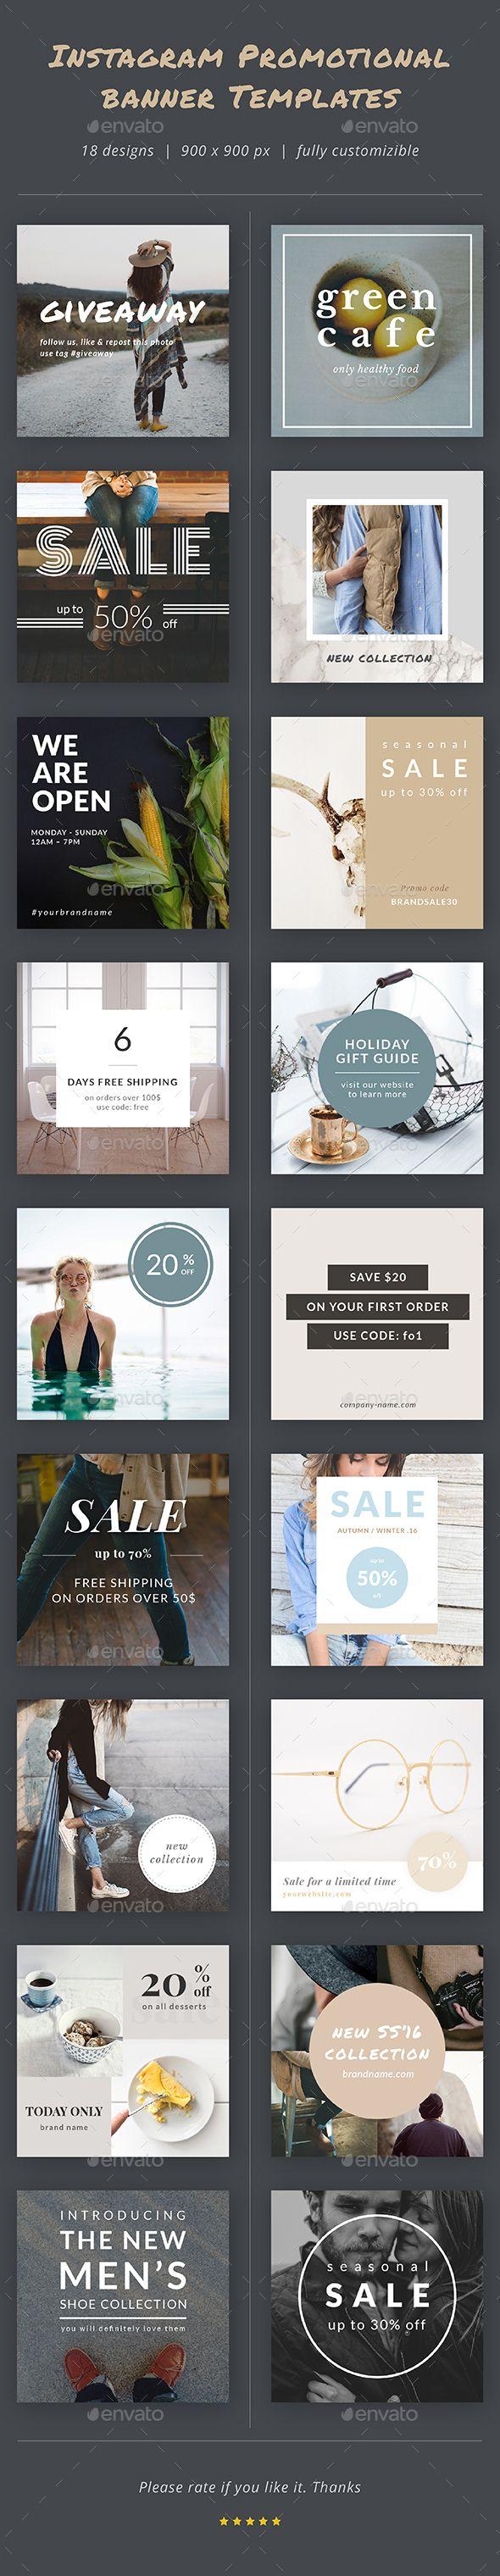 Instagram Promotional Banner Templates | Pinterest | Promotional ...